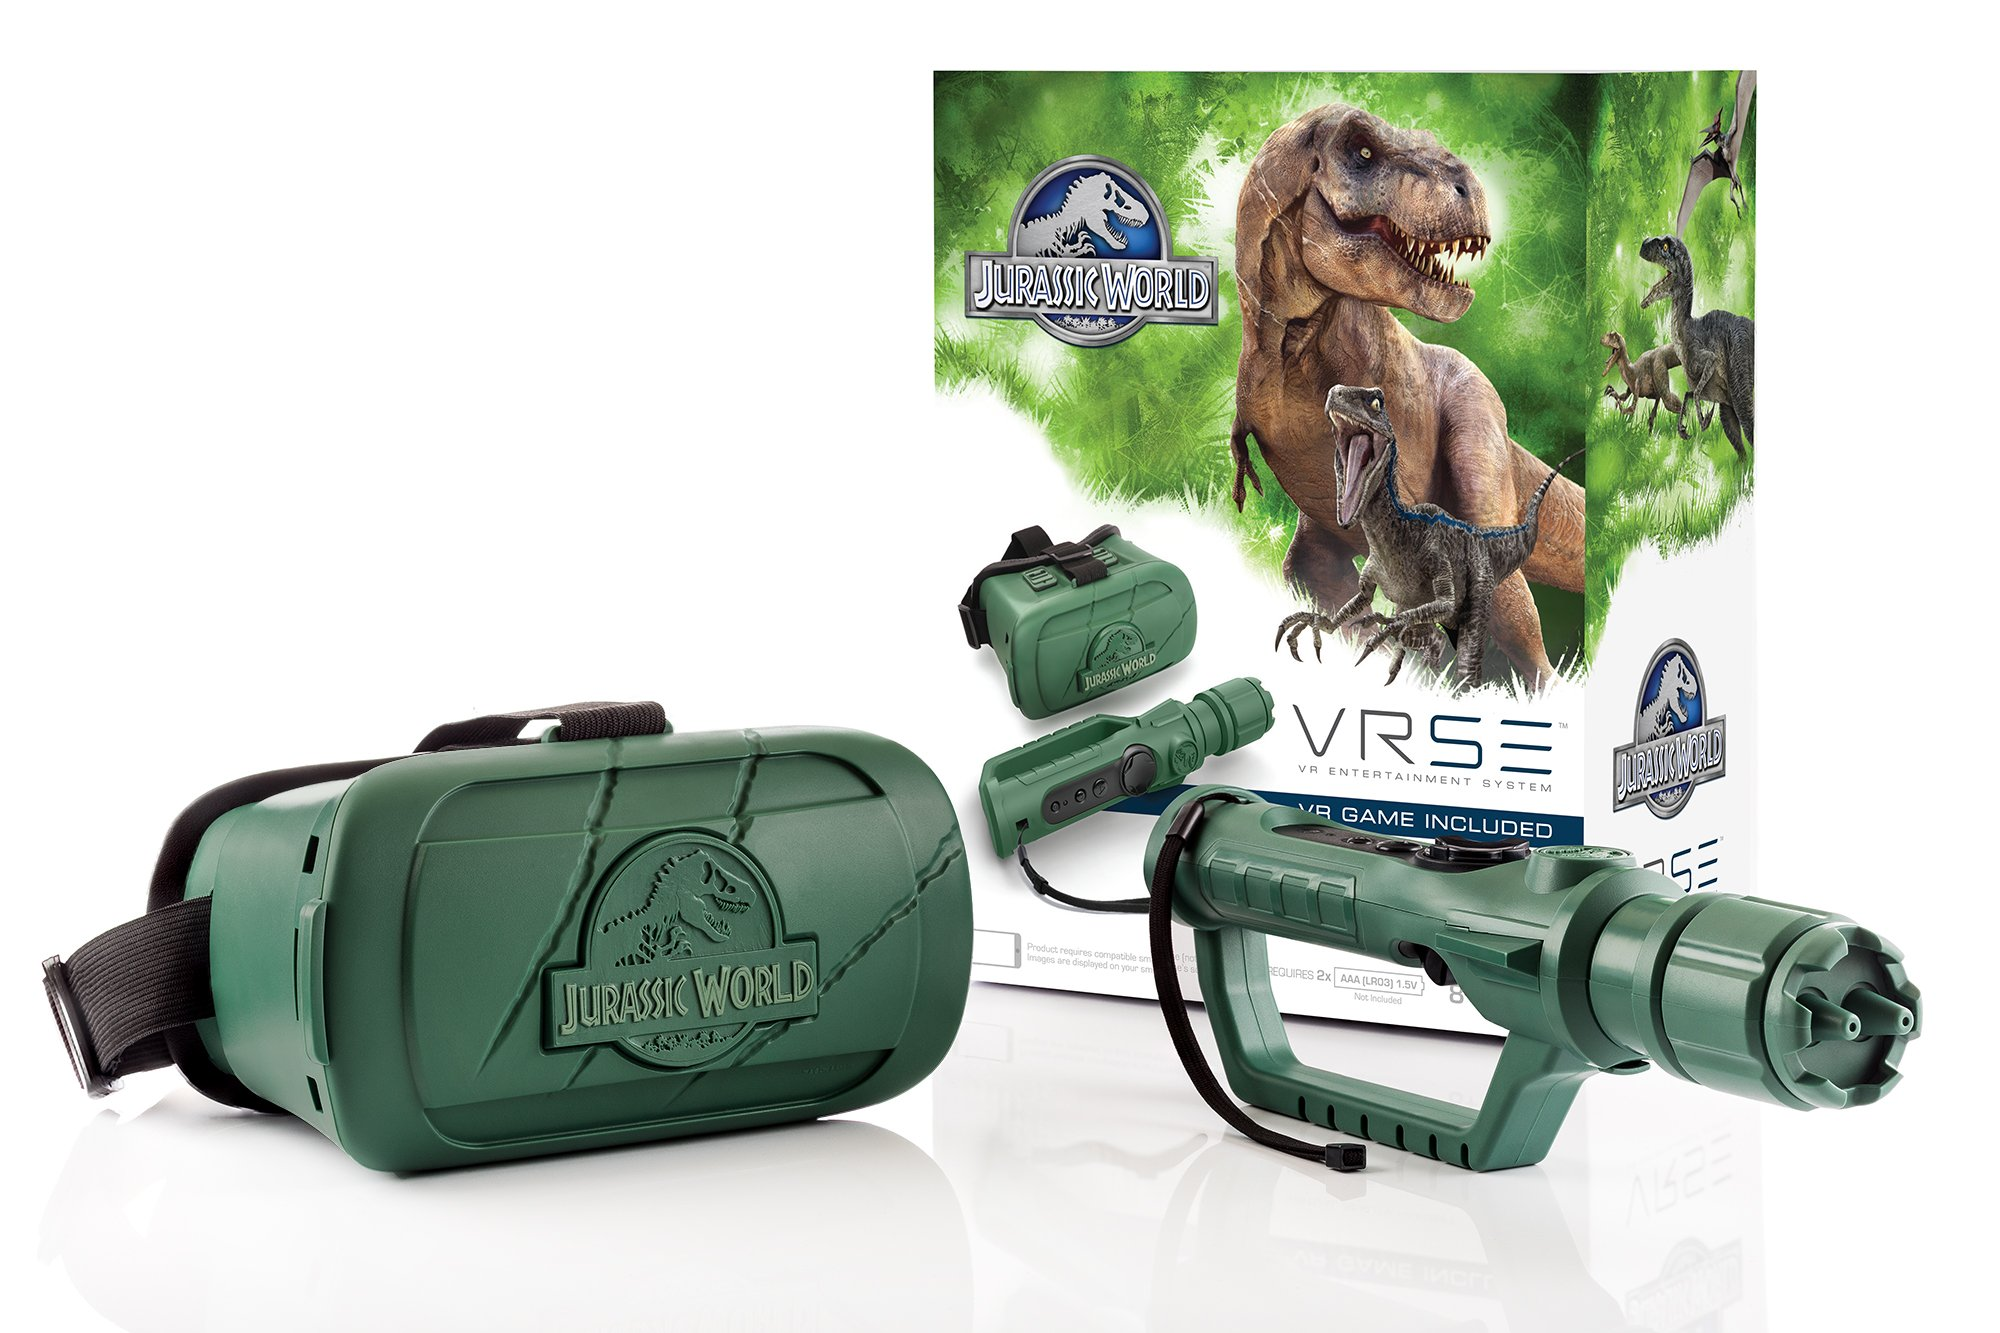 VRSE Jurassic World Virtual Reality Set by VRSE